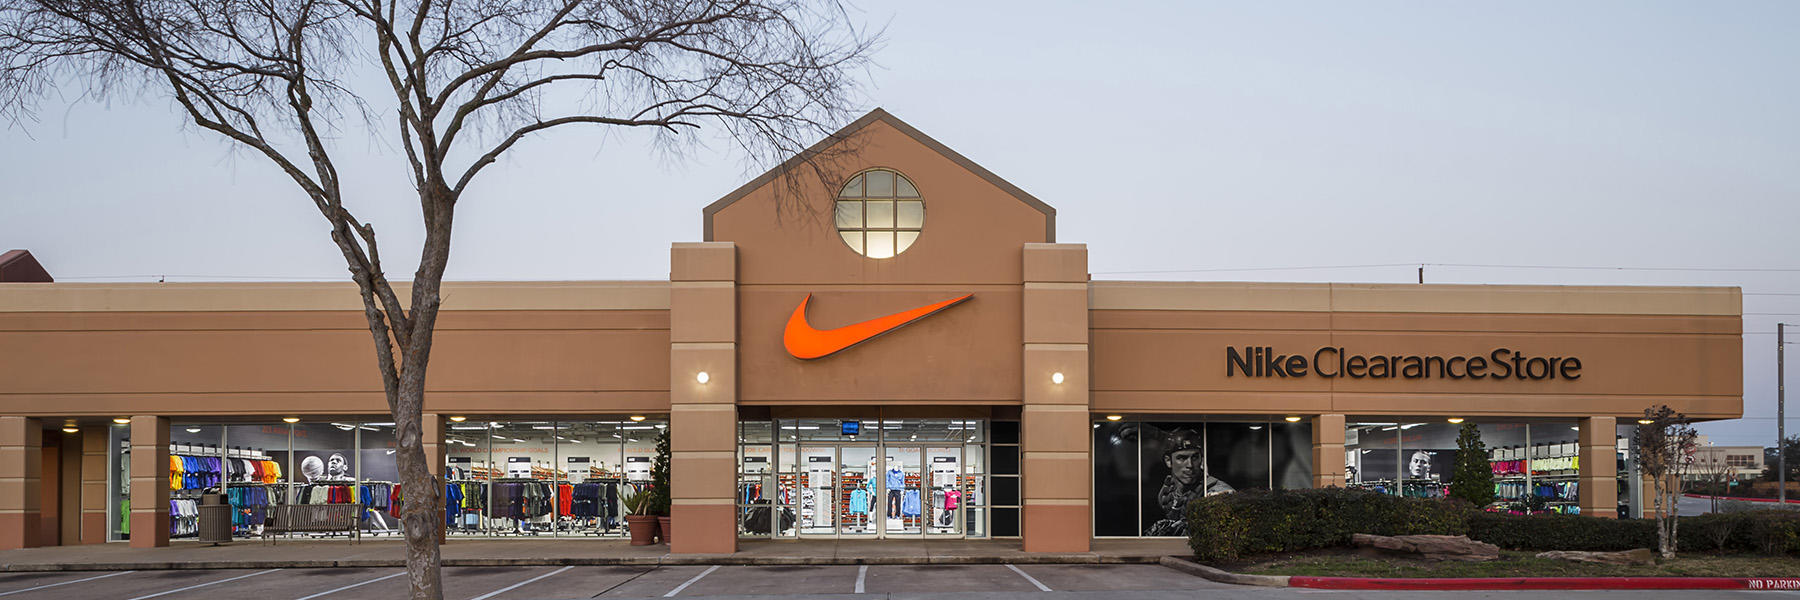 Nike Magasin De Sortie Houston Tx Vente en ligne sortie 2014 nouveau vente sTrAH